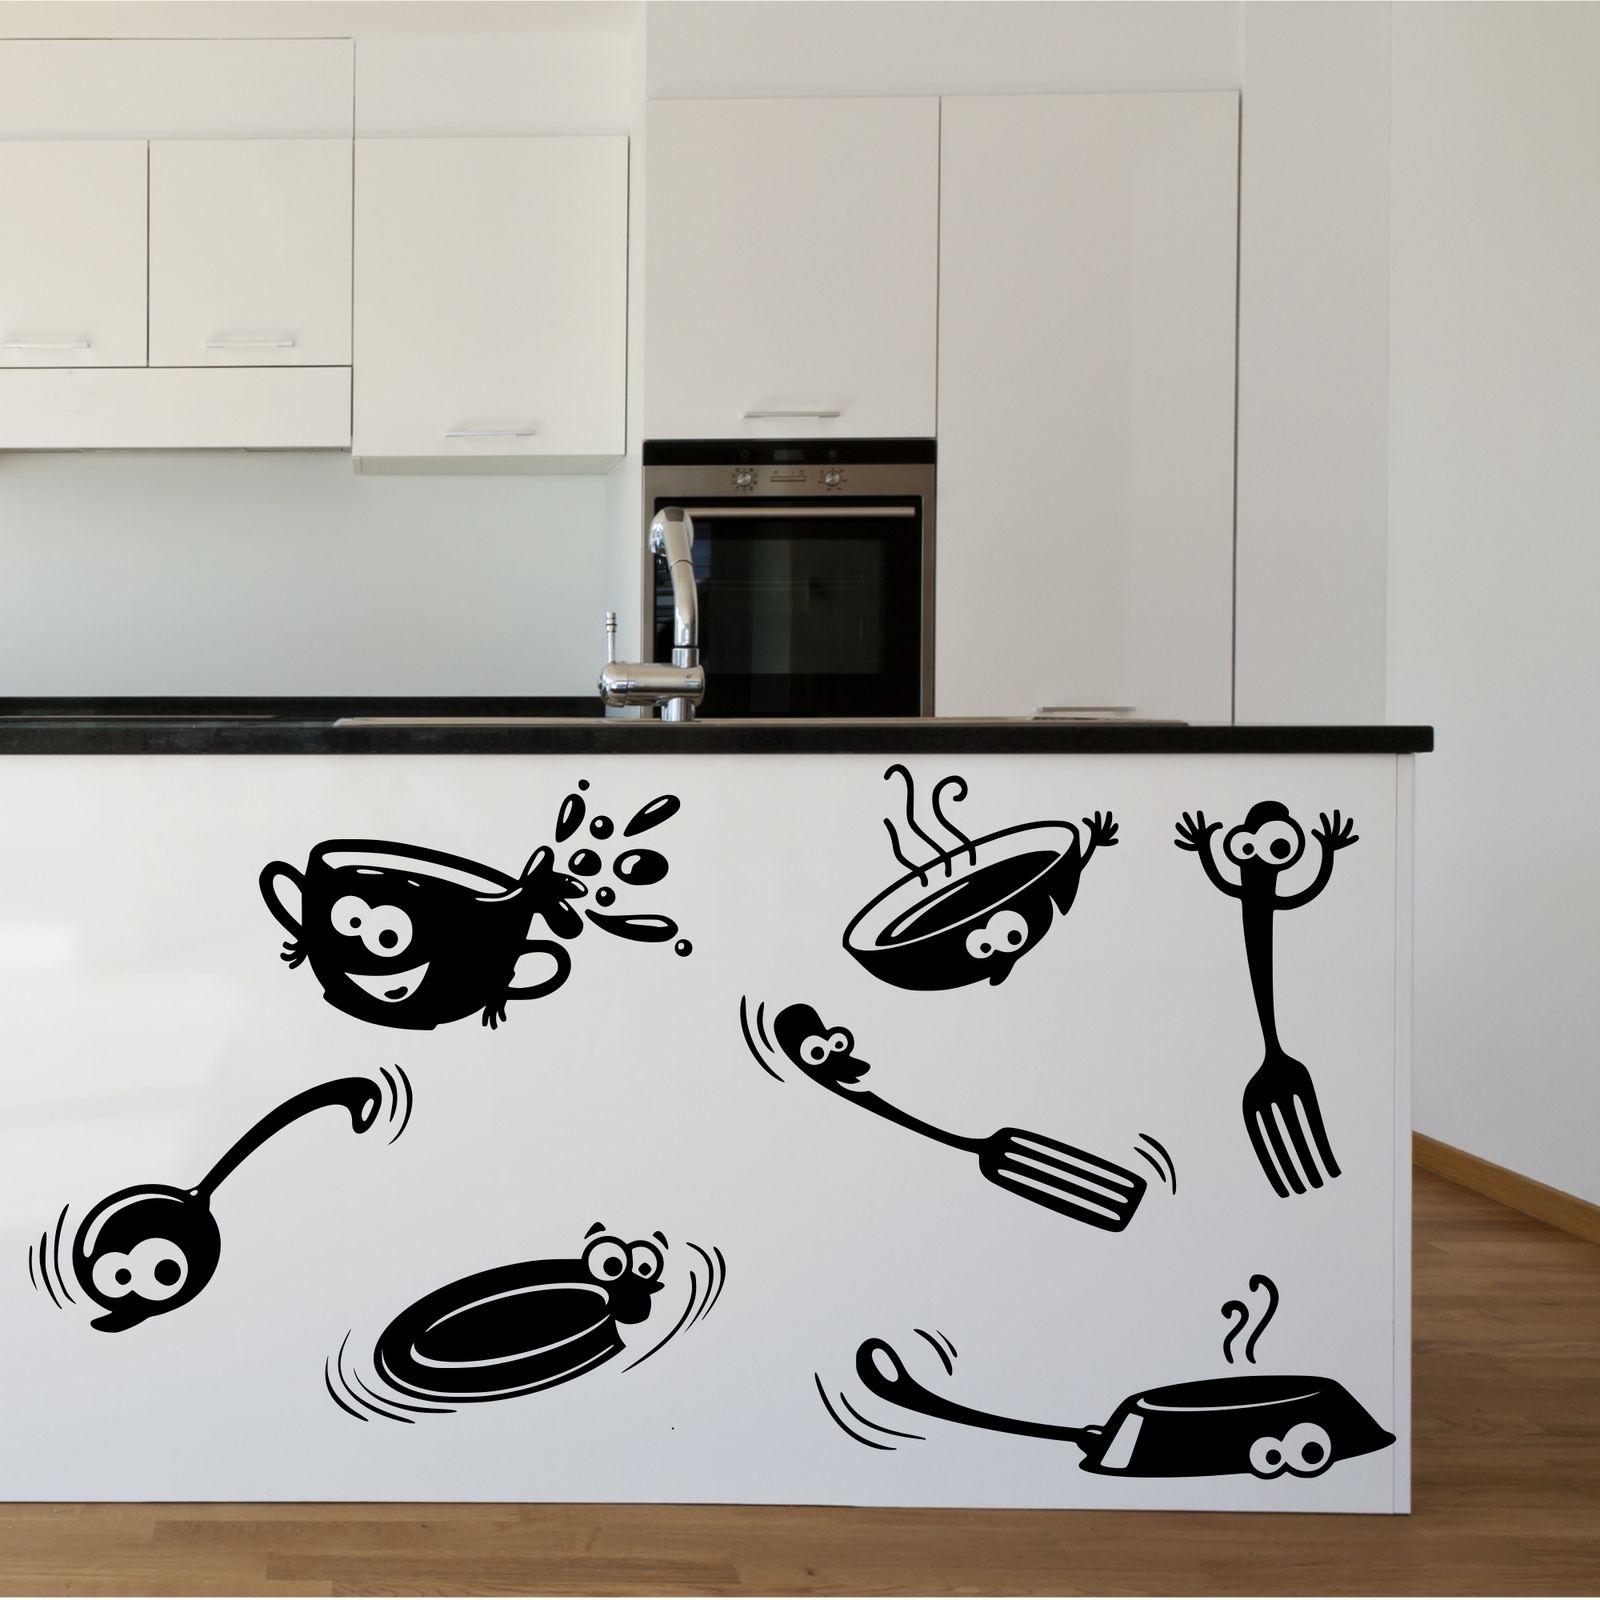 Kitchen Cupboard Cartoon Stickers Vinyl Wall Art Decal